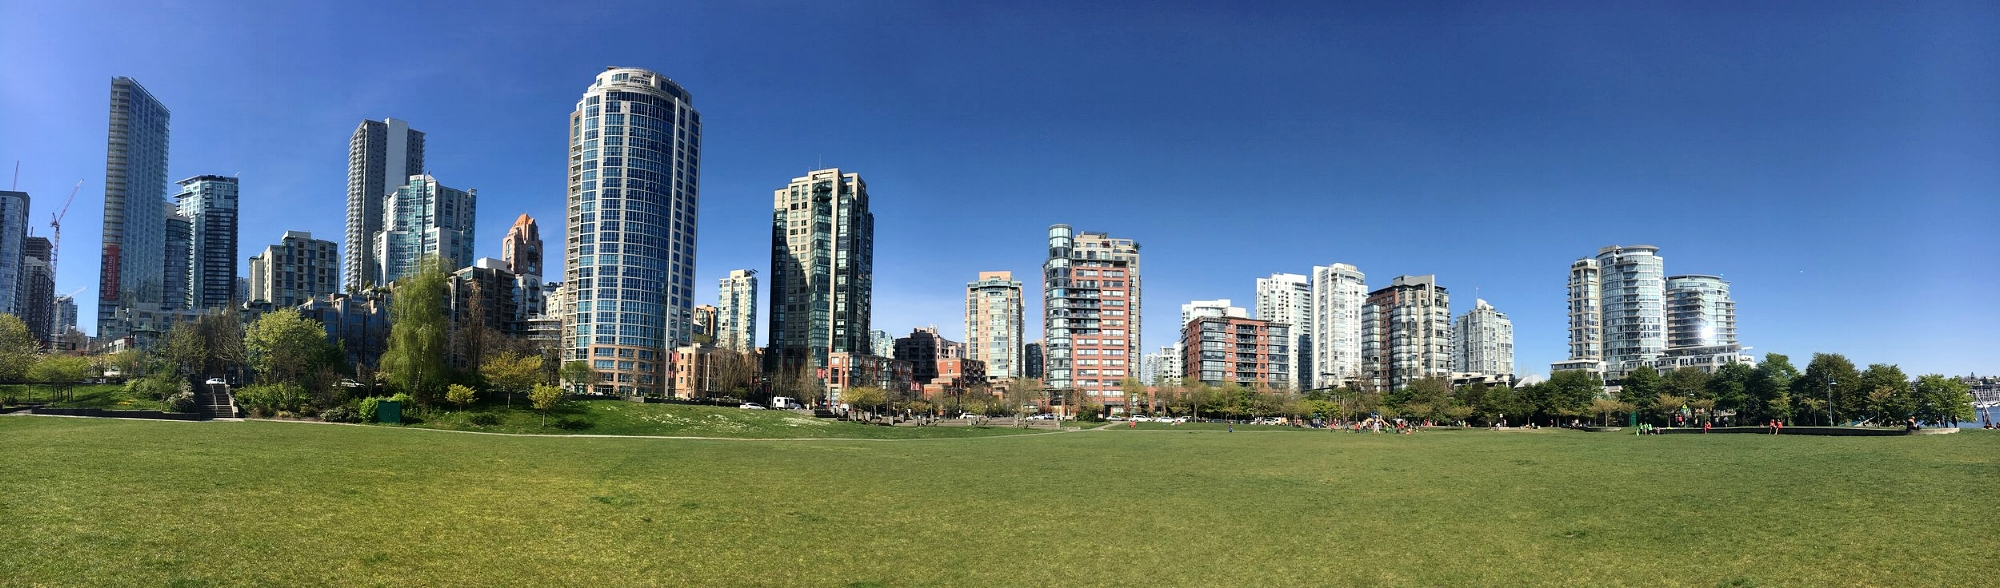 Photo taken by Darren Henry in Vancouver